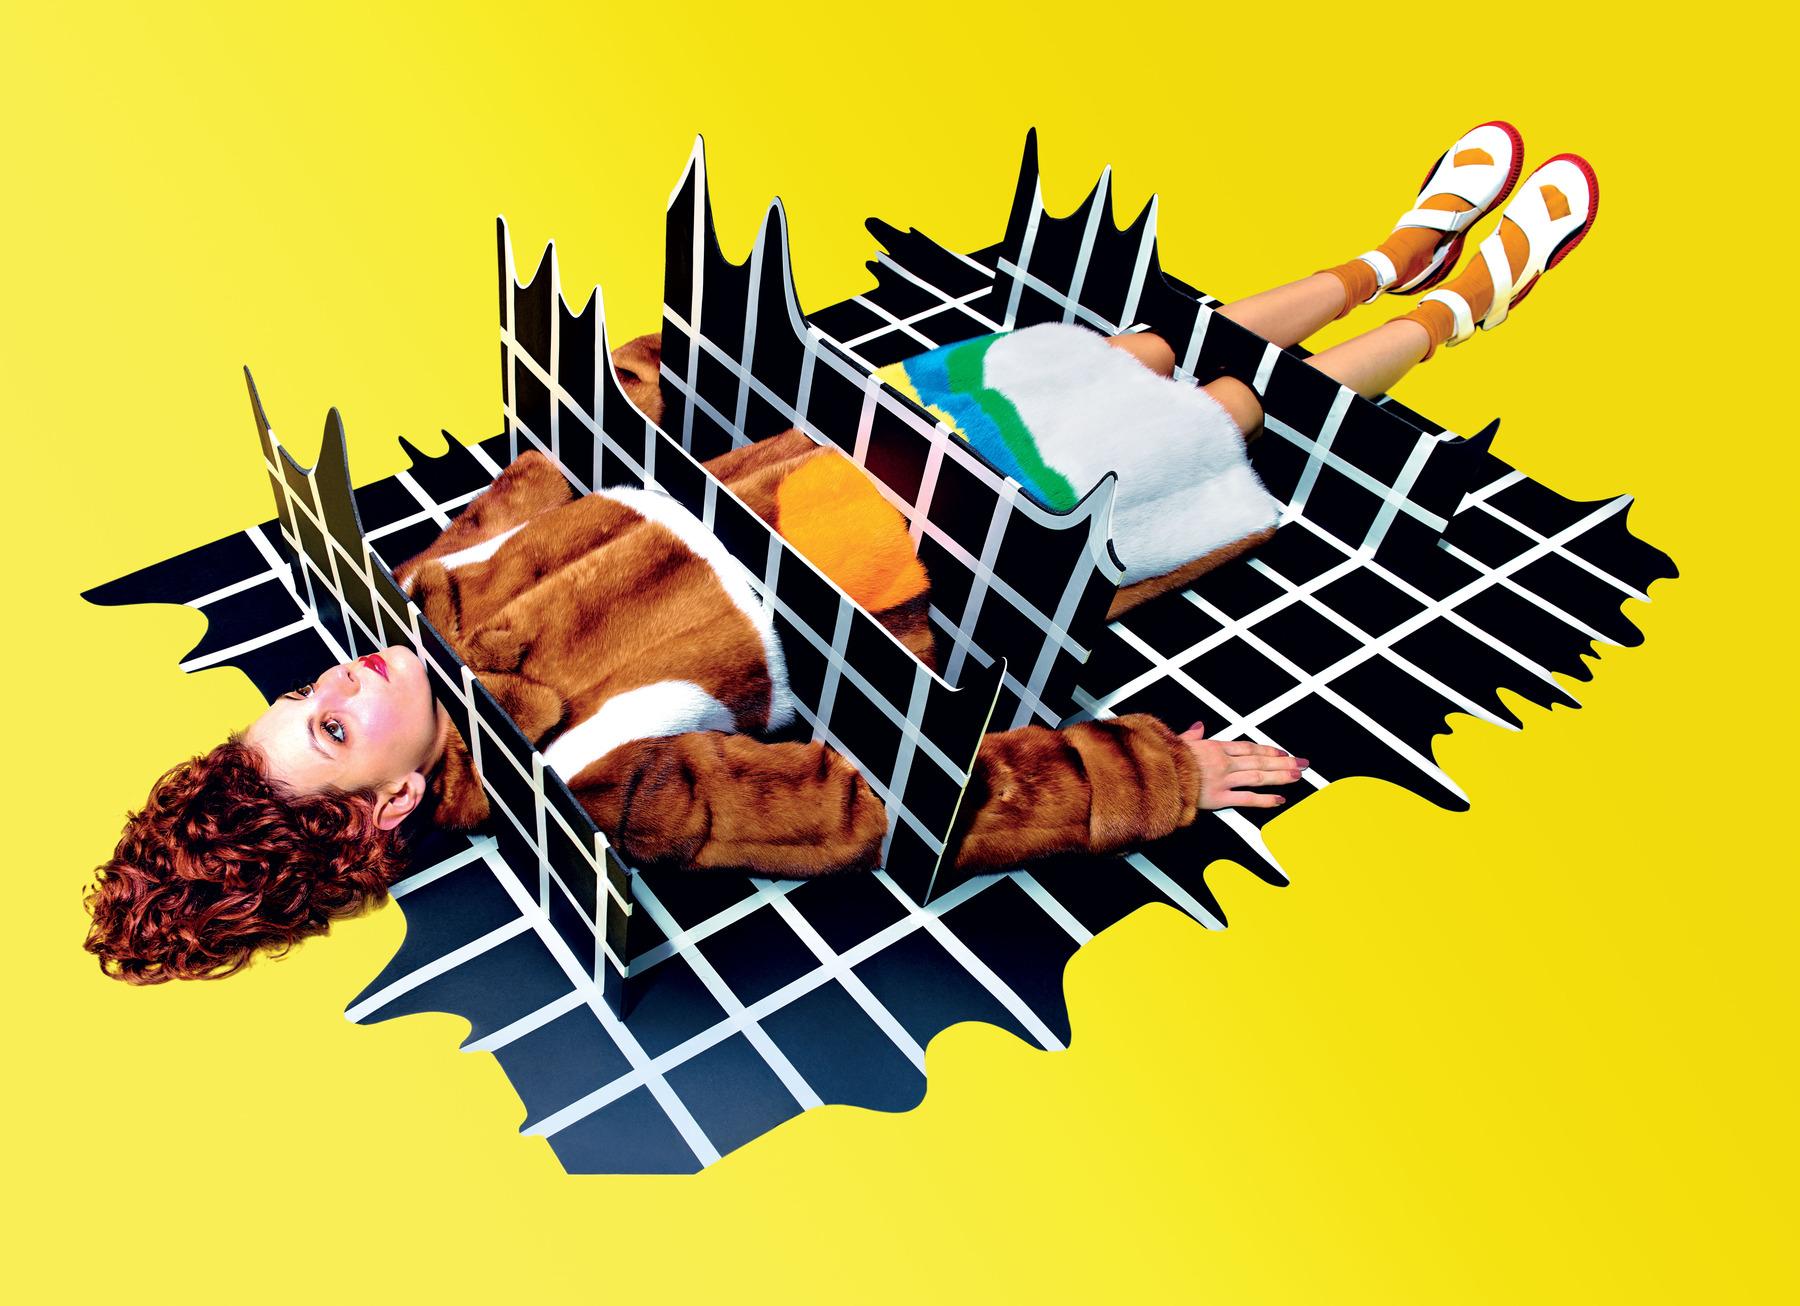 Magic Show: La hipersaturada moda primavera 2014 de Maurizio Cattelan y Pierpaolo Ferrari